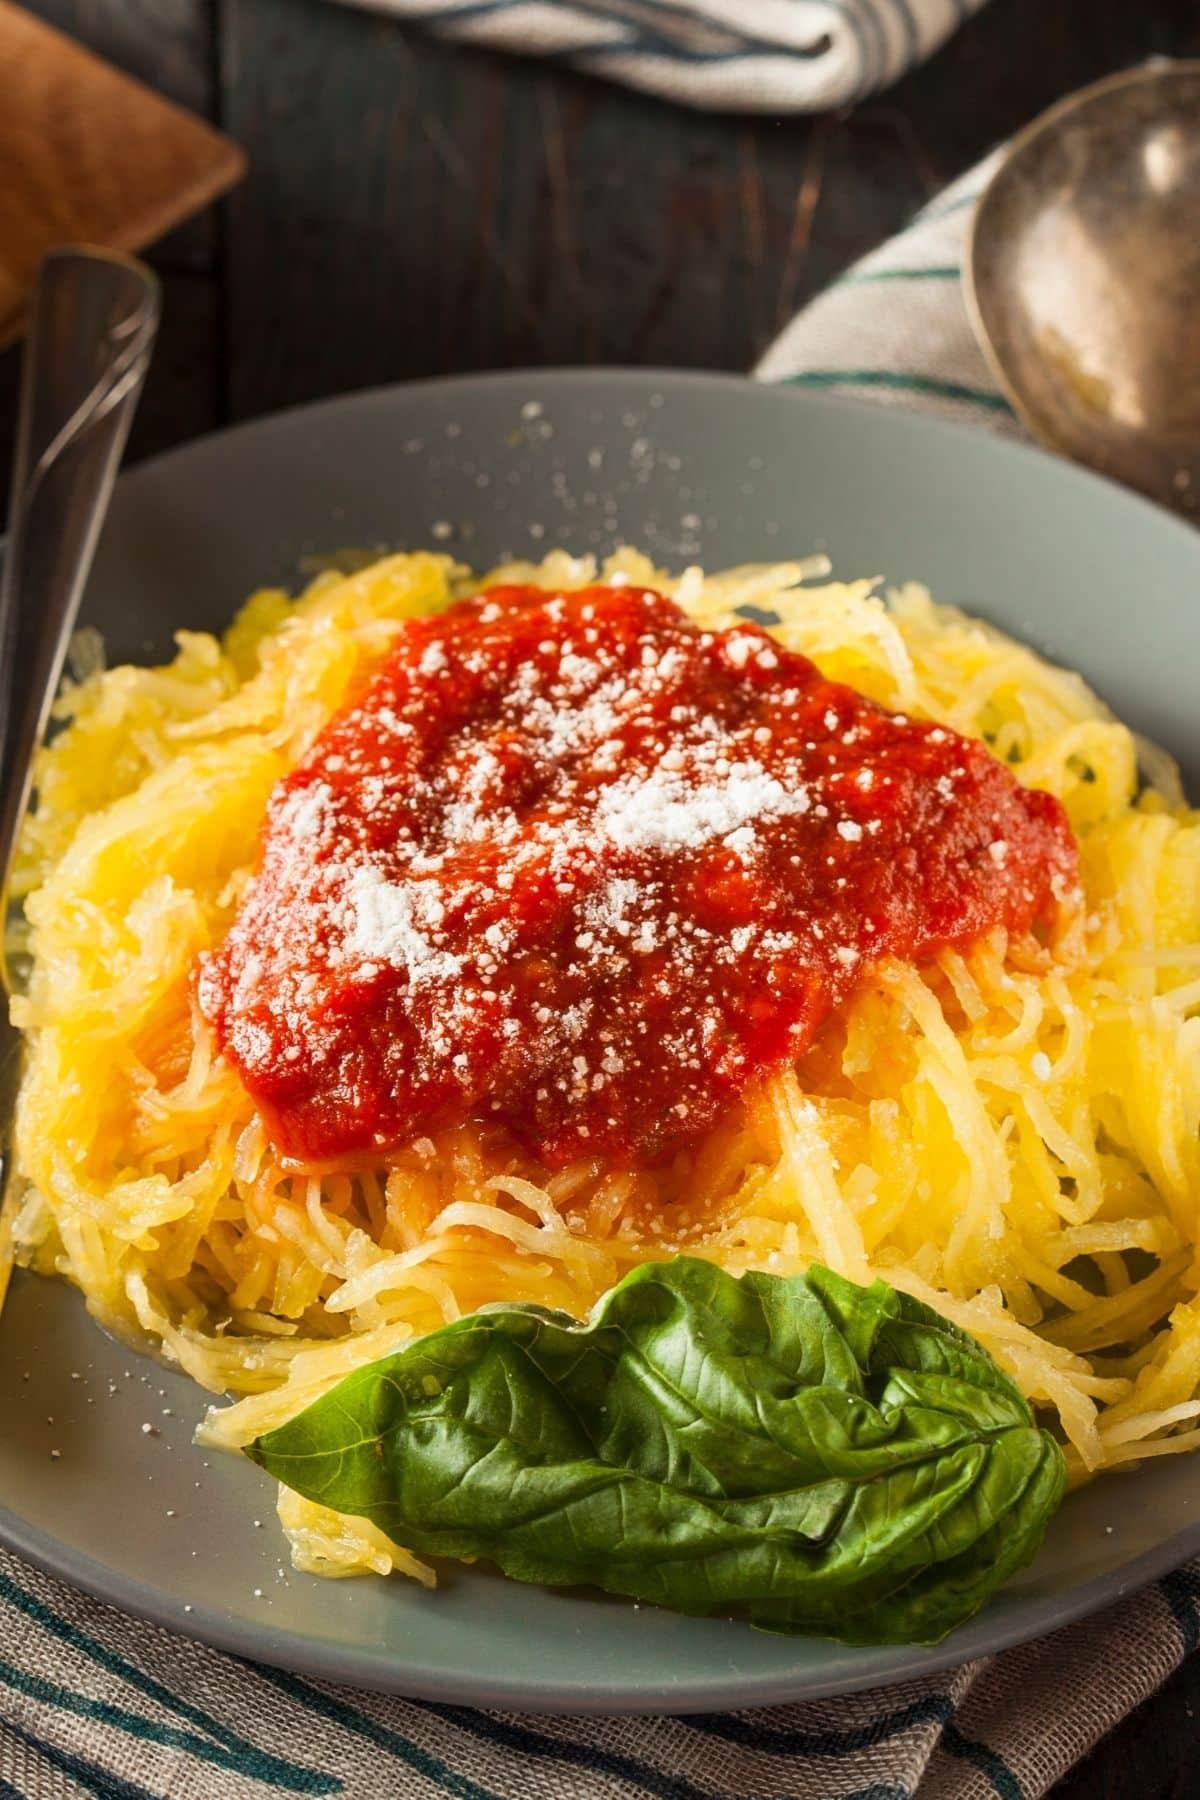 cooked spaghetti squash with marinara